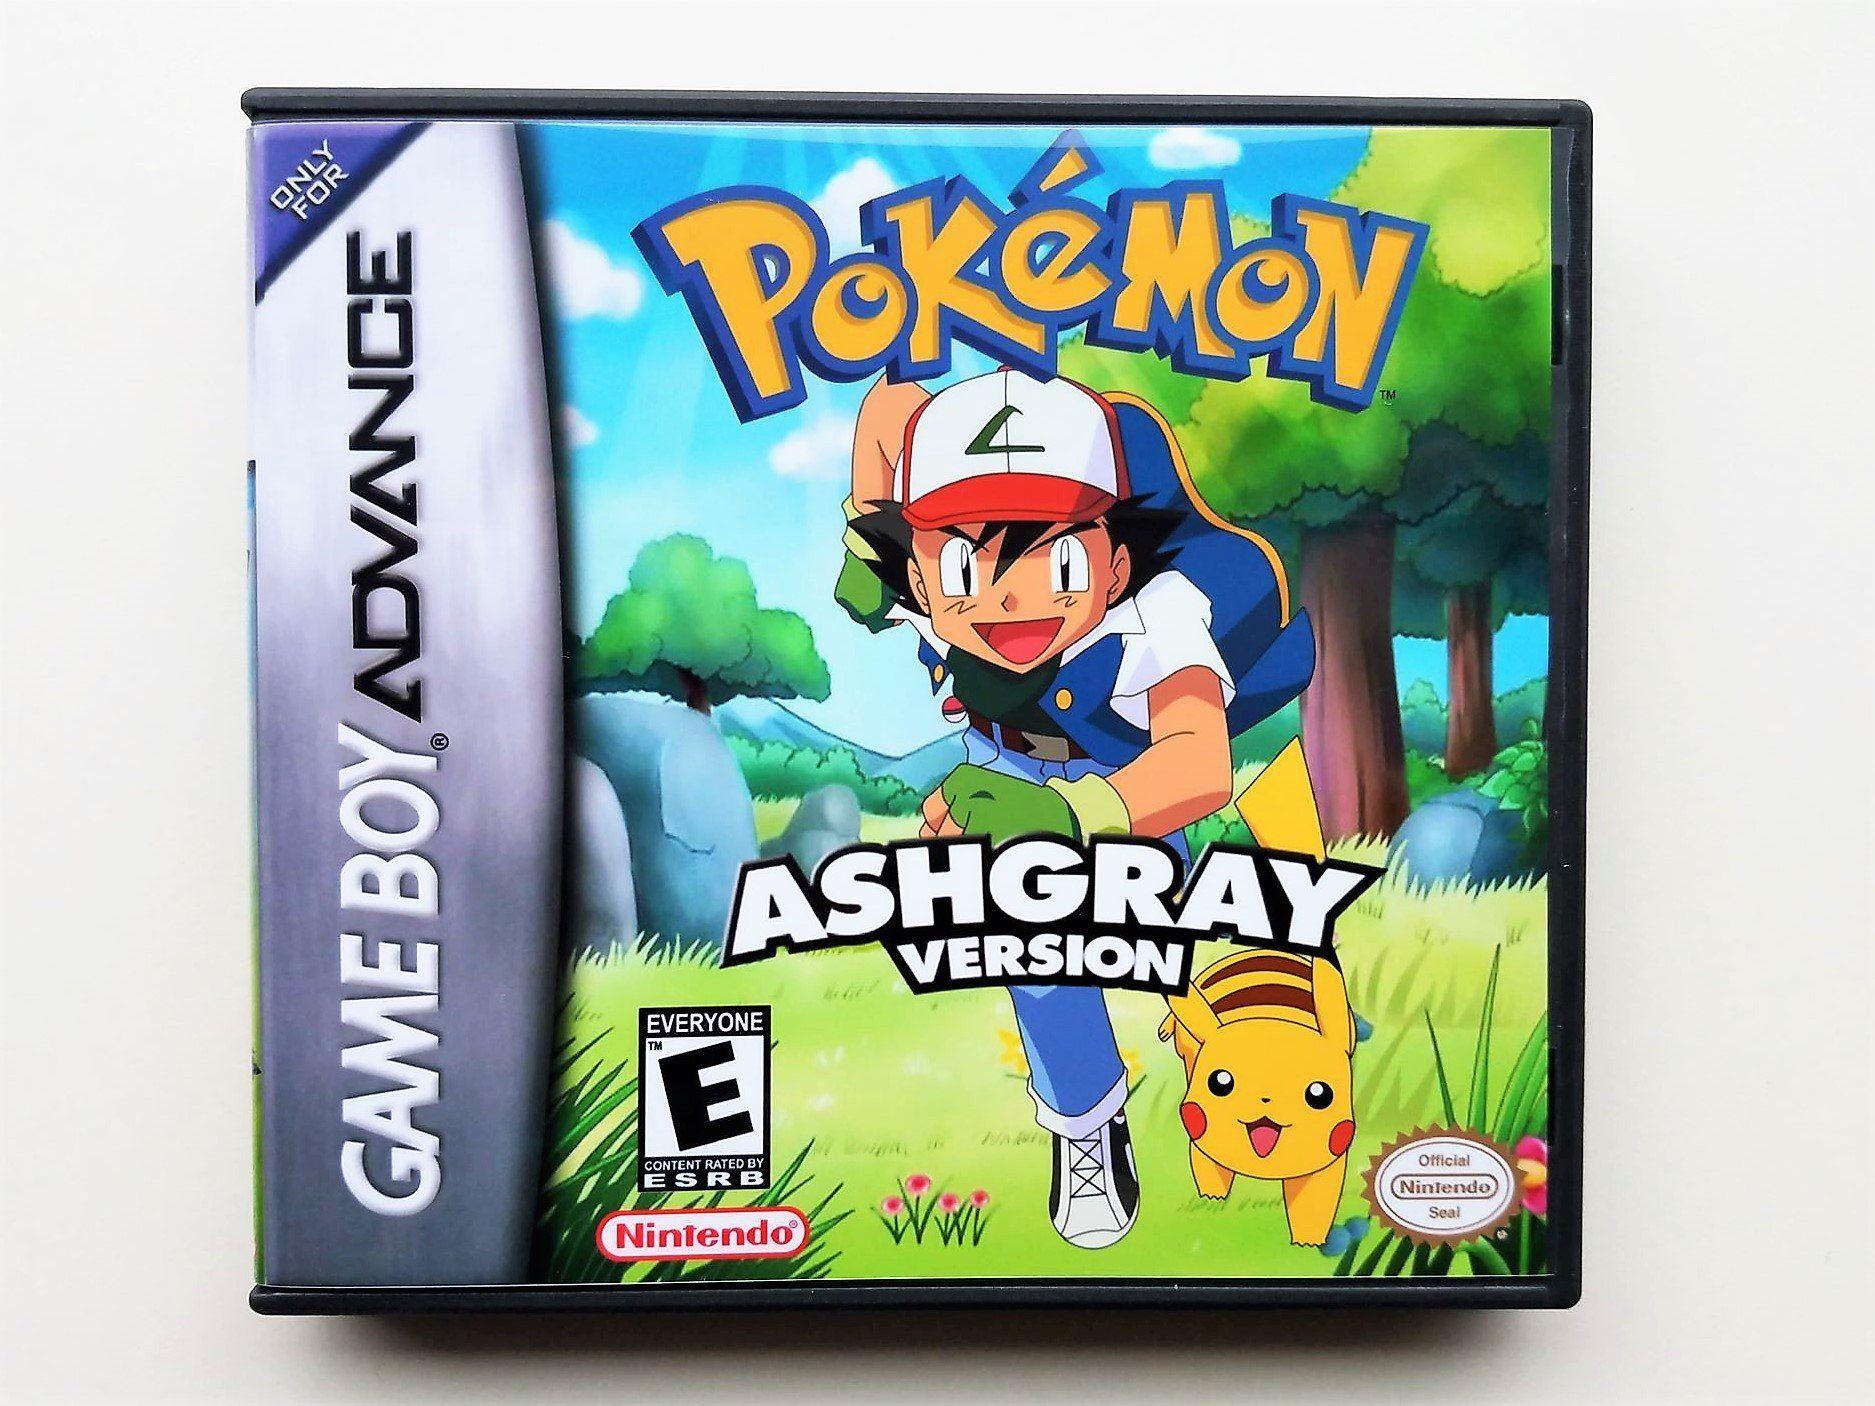 Pokemon Ash Gray Gba Pokemon Ash Gray Pokemon Games Like Pokemon